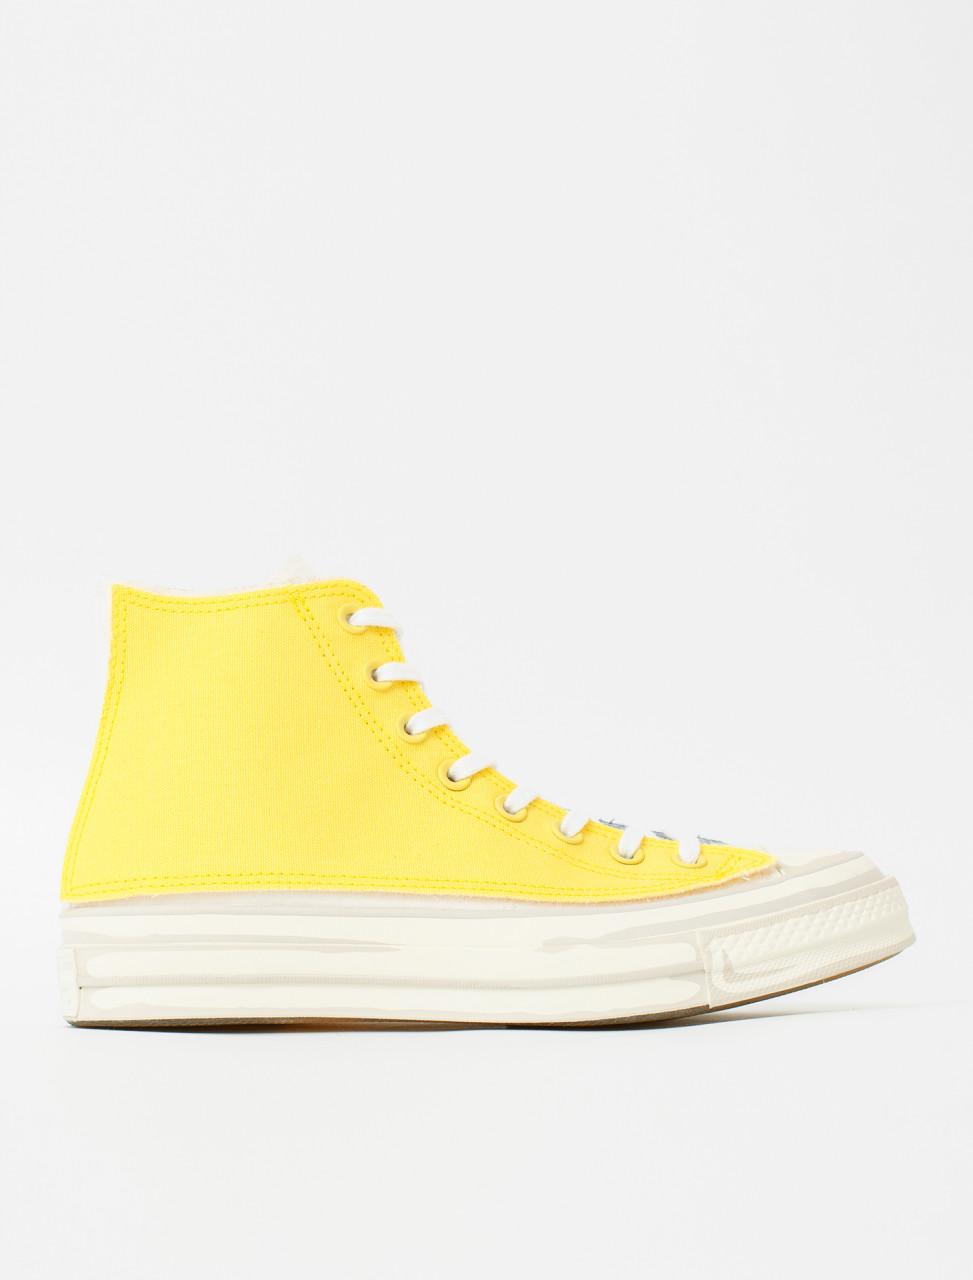 x Joshua Vides Chuck 70 HI Sneaker